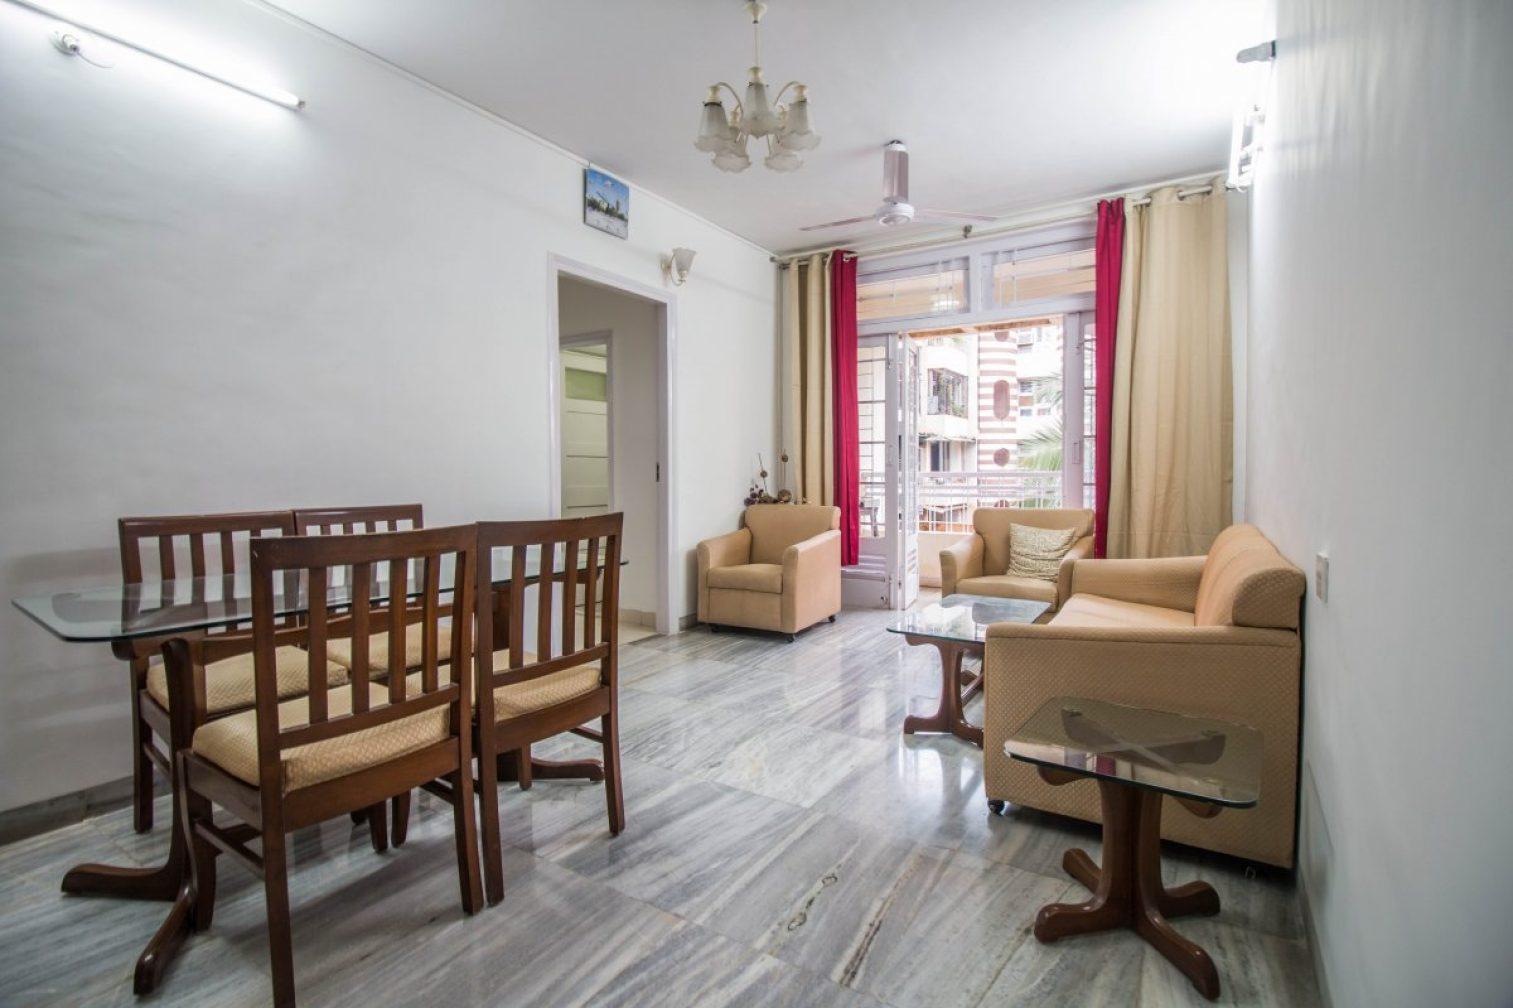 powai flats, real-estate, real estate